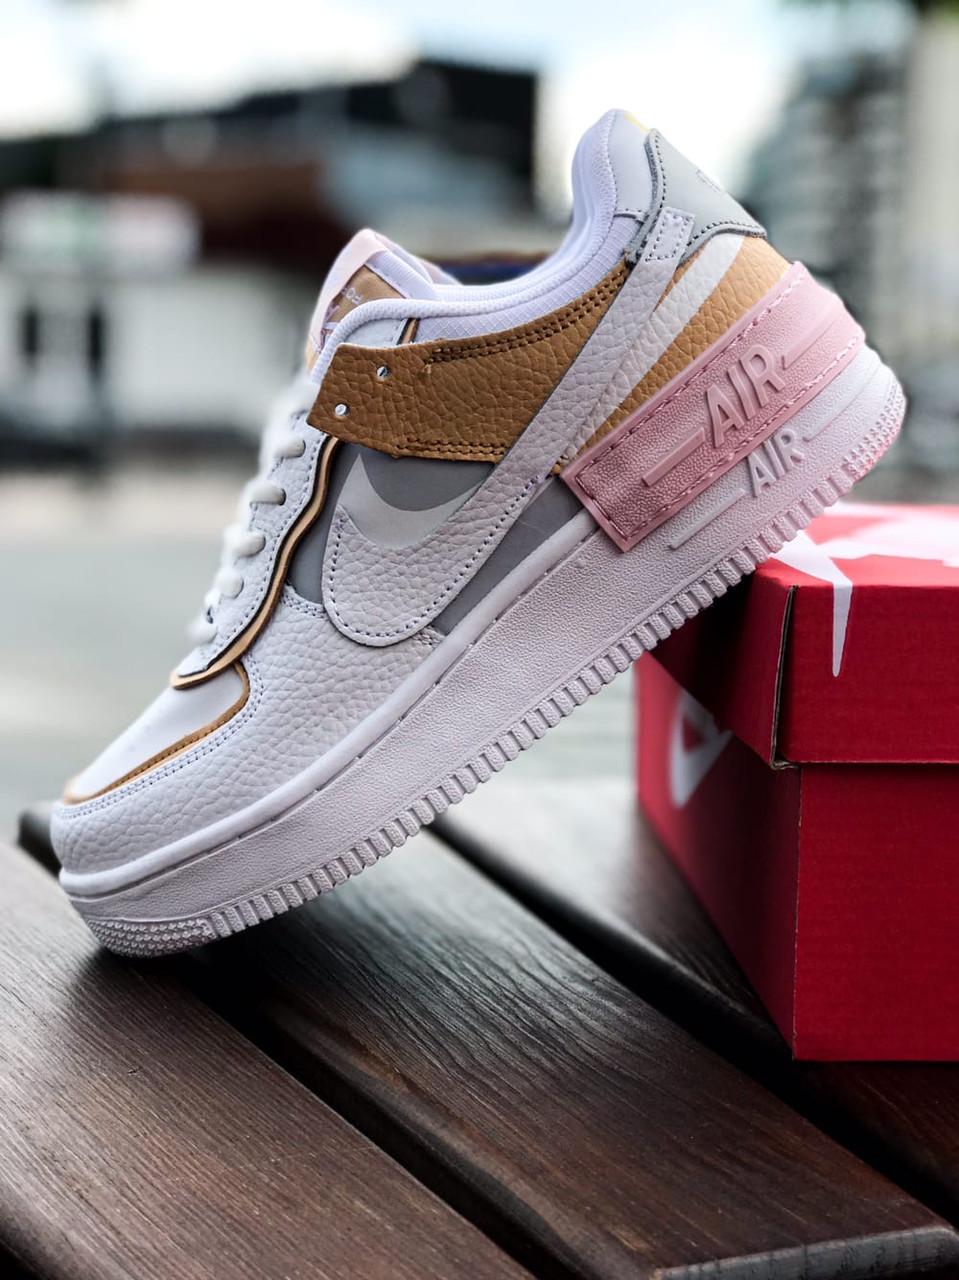 Кроссовки женские Nike Air force shadow White Grey Brown 40, разм